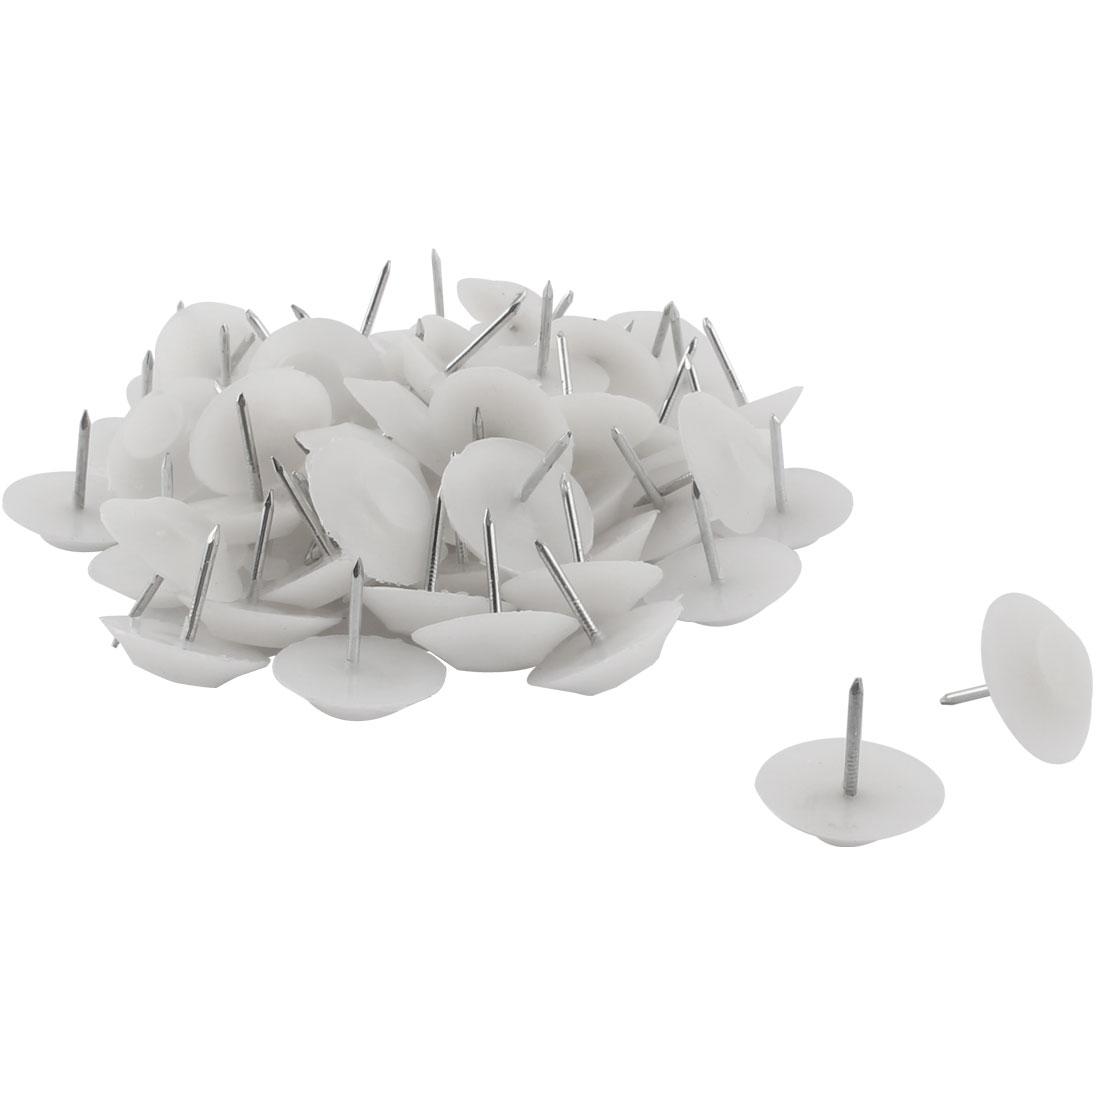 Furniture Feet Anti-slide Floor Protector Pad Nails 20mm Head Dia 50 Pcs